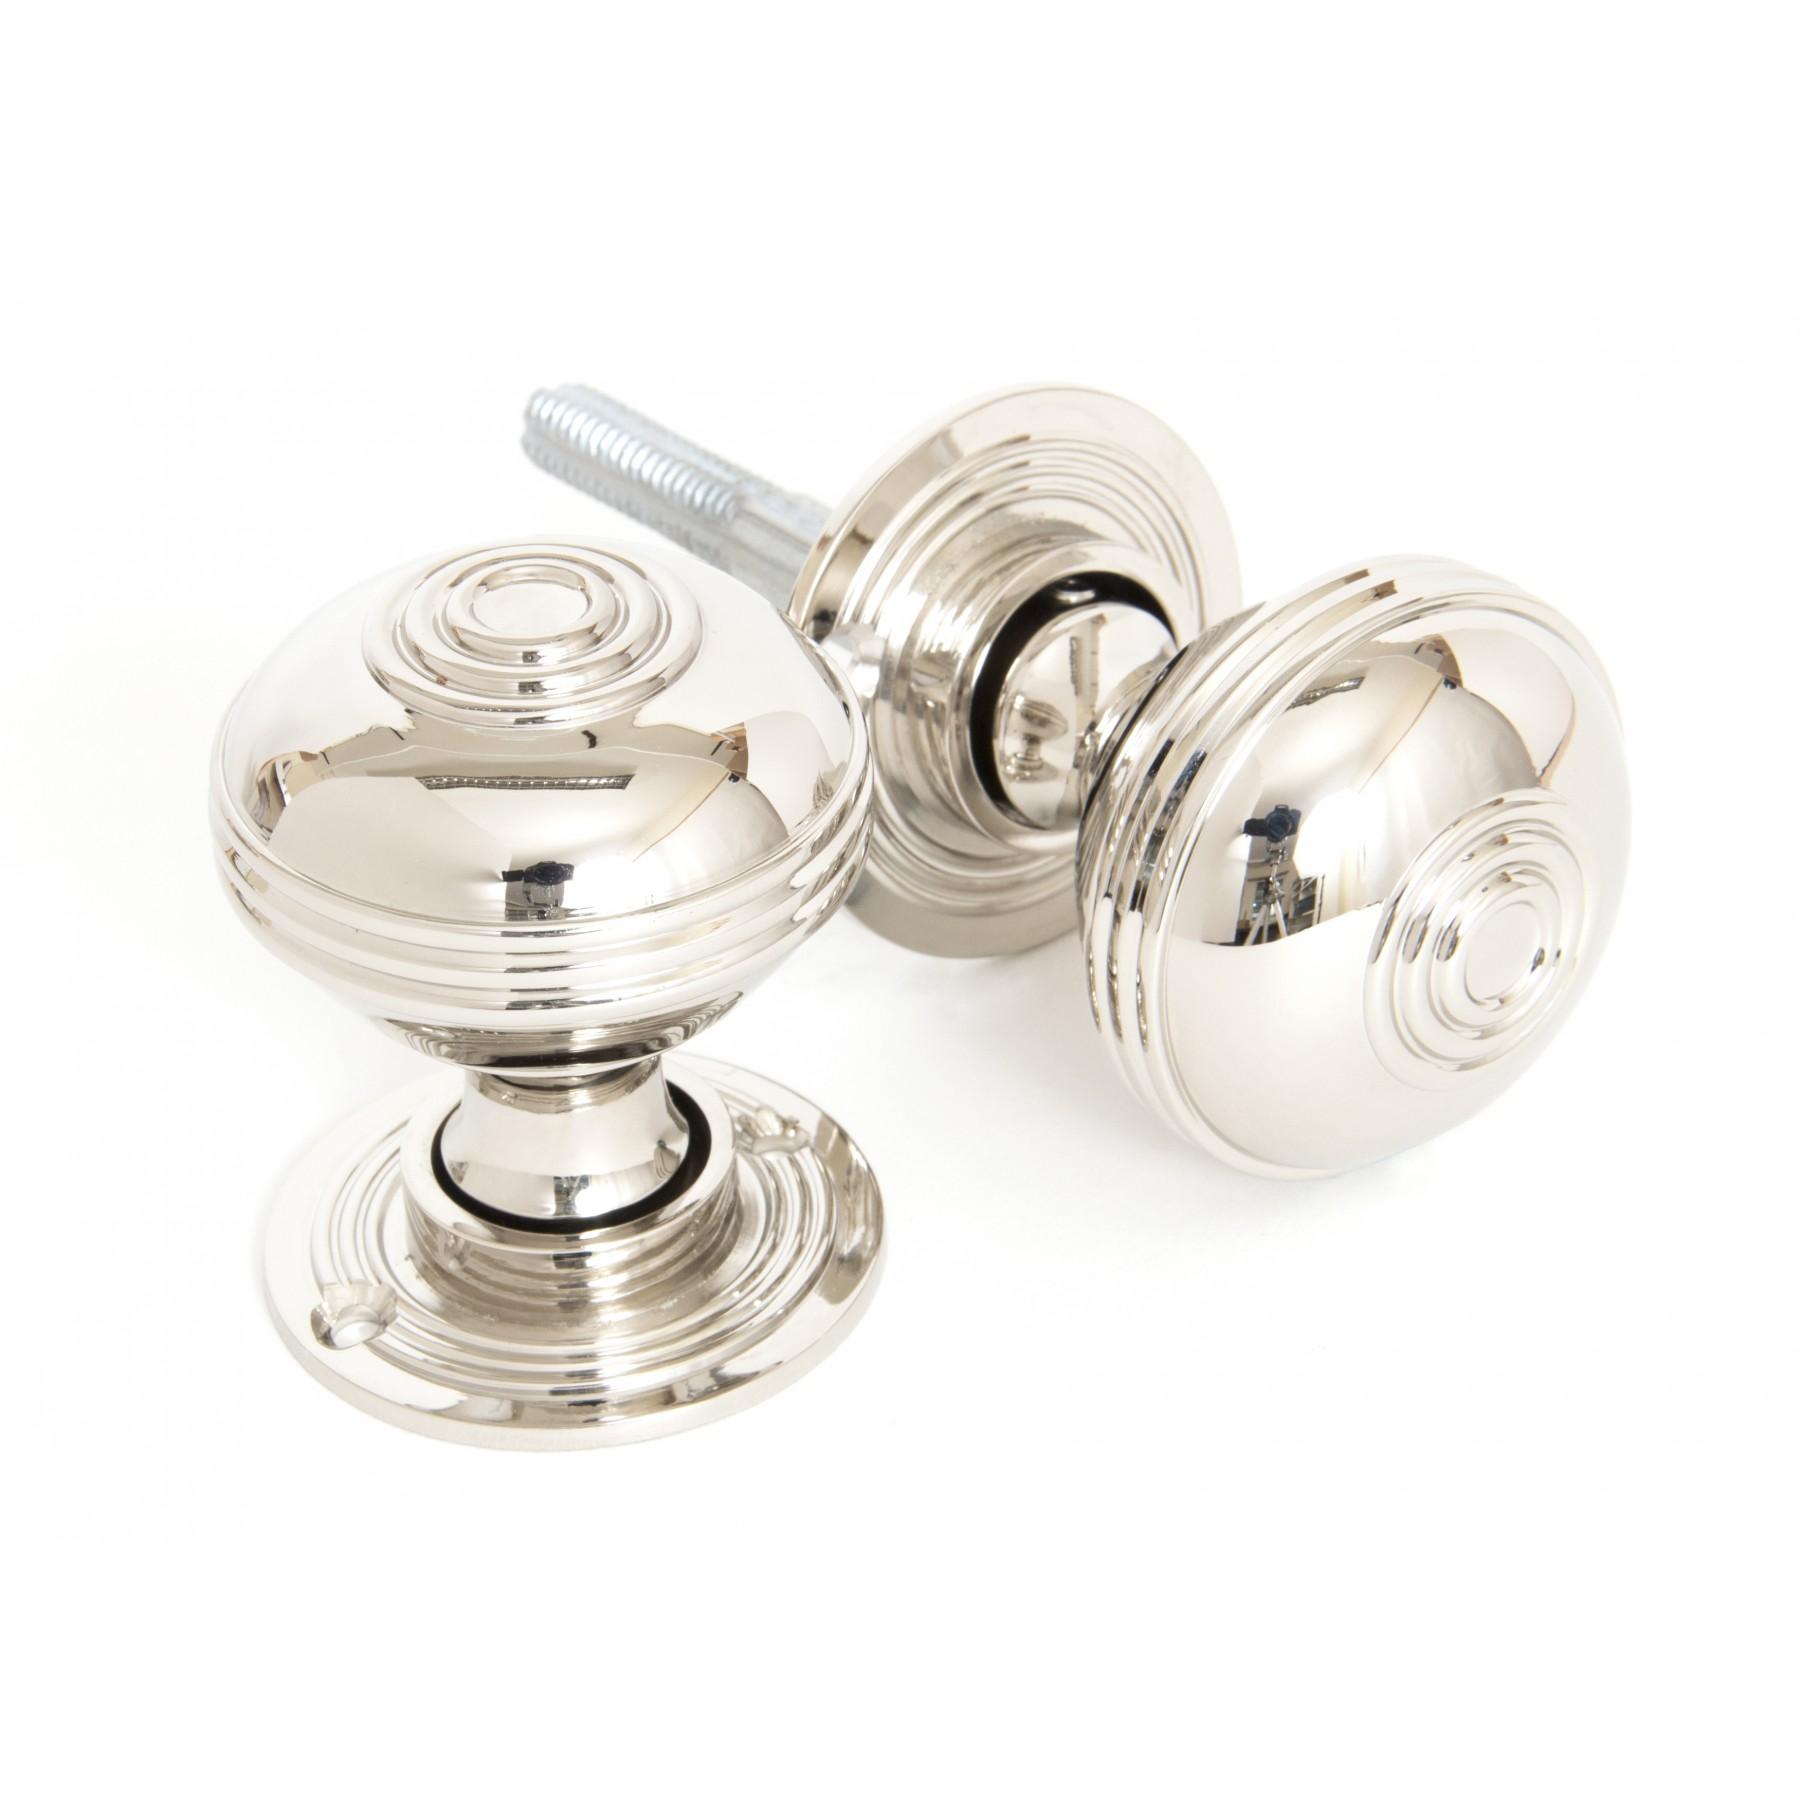 polished nickel door knobs photo - 12